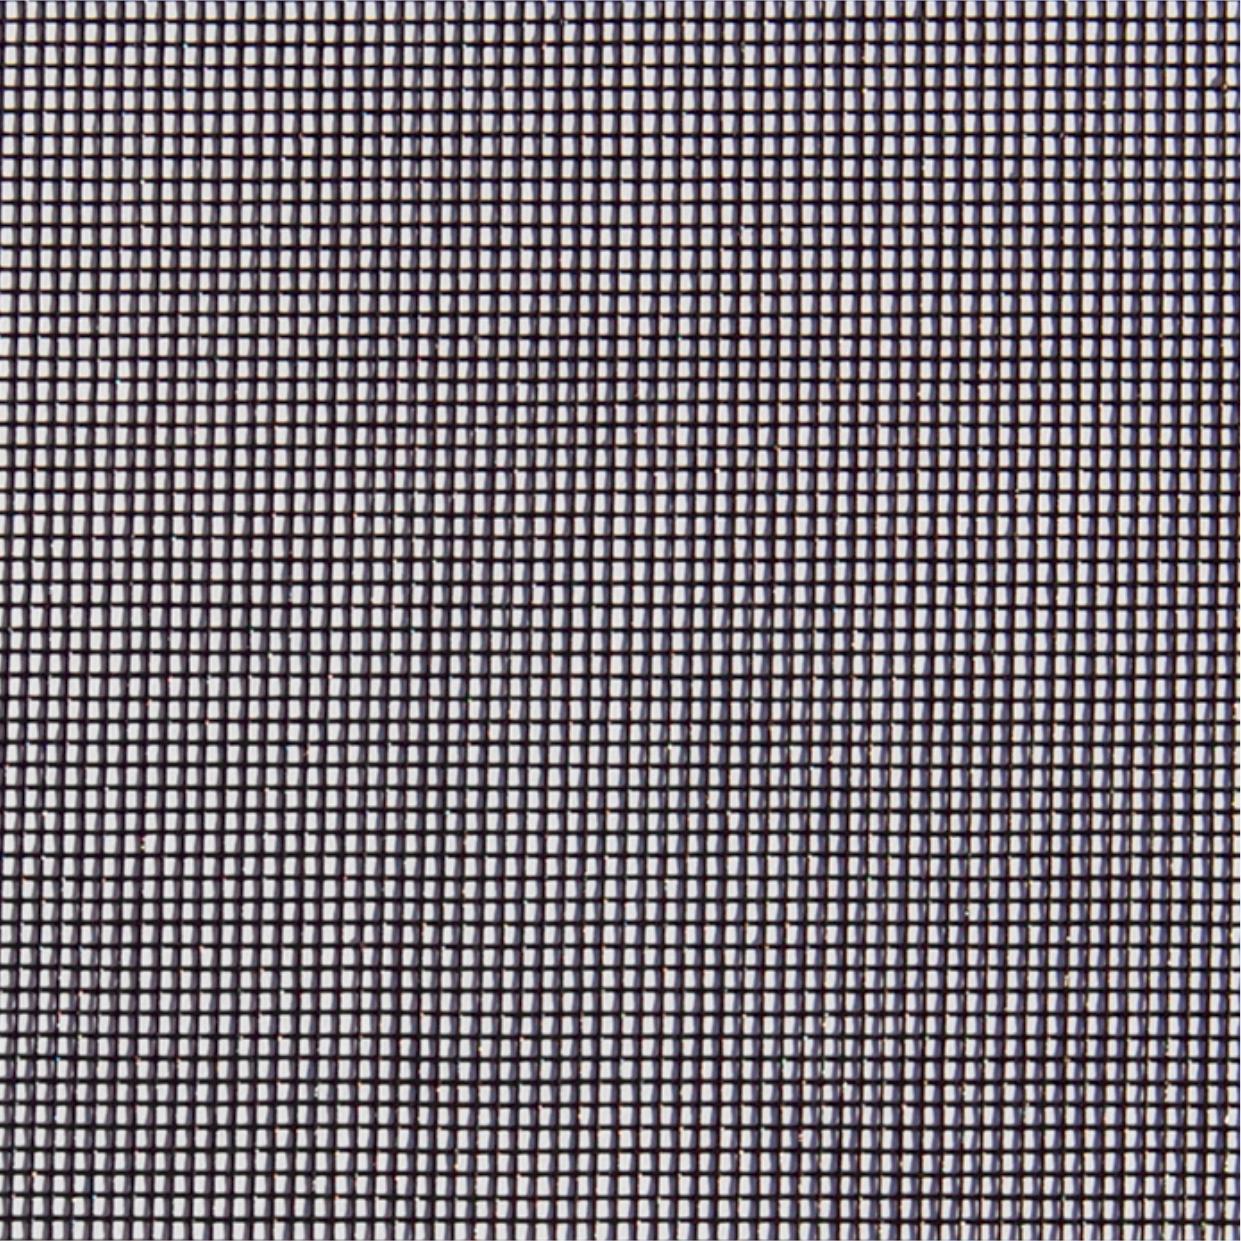 Fiberglasgewebe 18x16.011 ANTHRAZIT